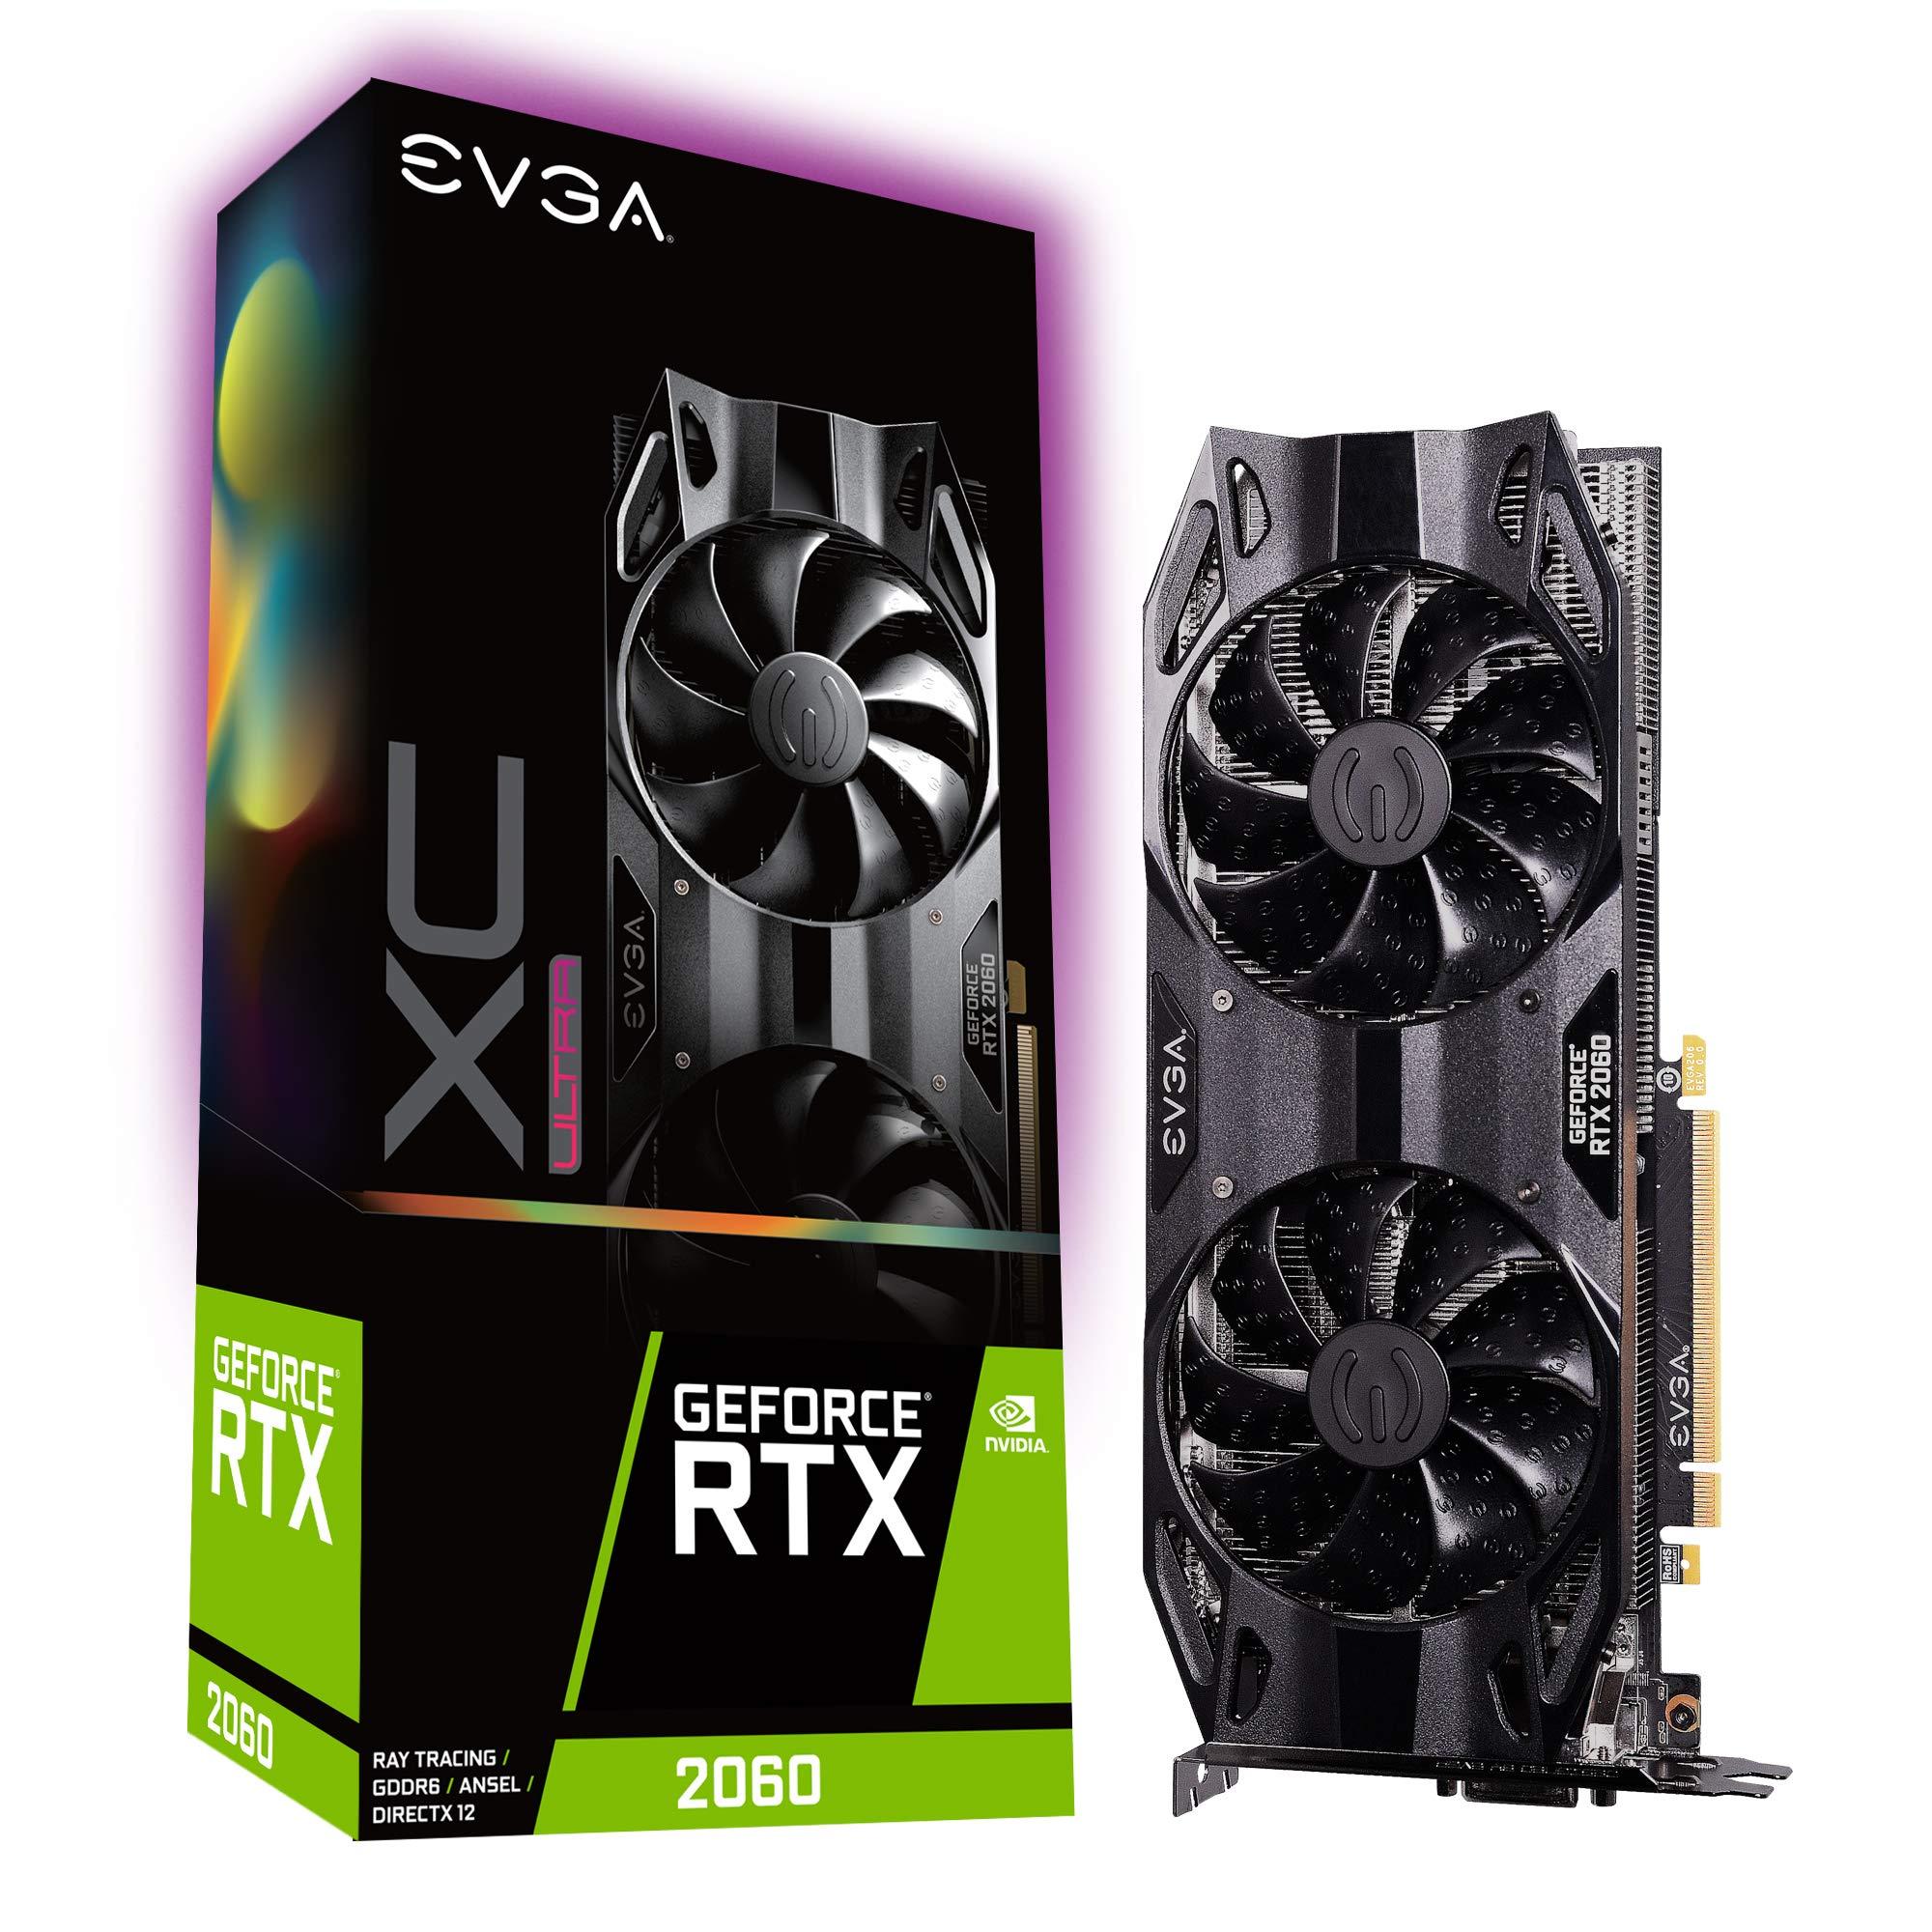 EVGA GeForce RTX 2060 XC Ultra Gaming, 6GB GDDR6, Dual HDB Fans Graphics Card 06G-P4-2167-KR